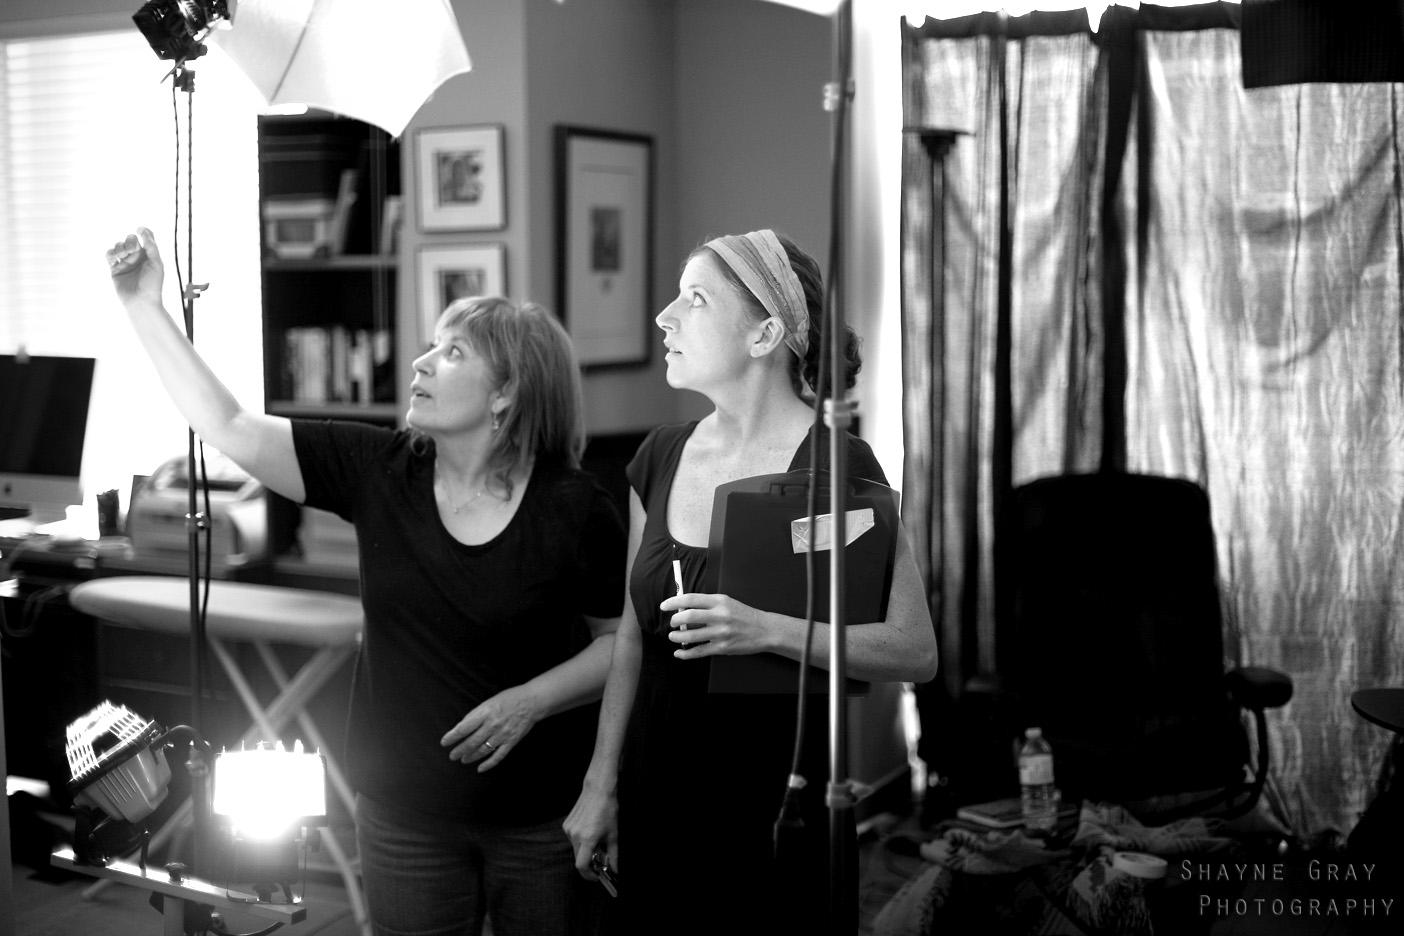 my-fiance-film-production-bts-shayne-gray-1630.jpg